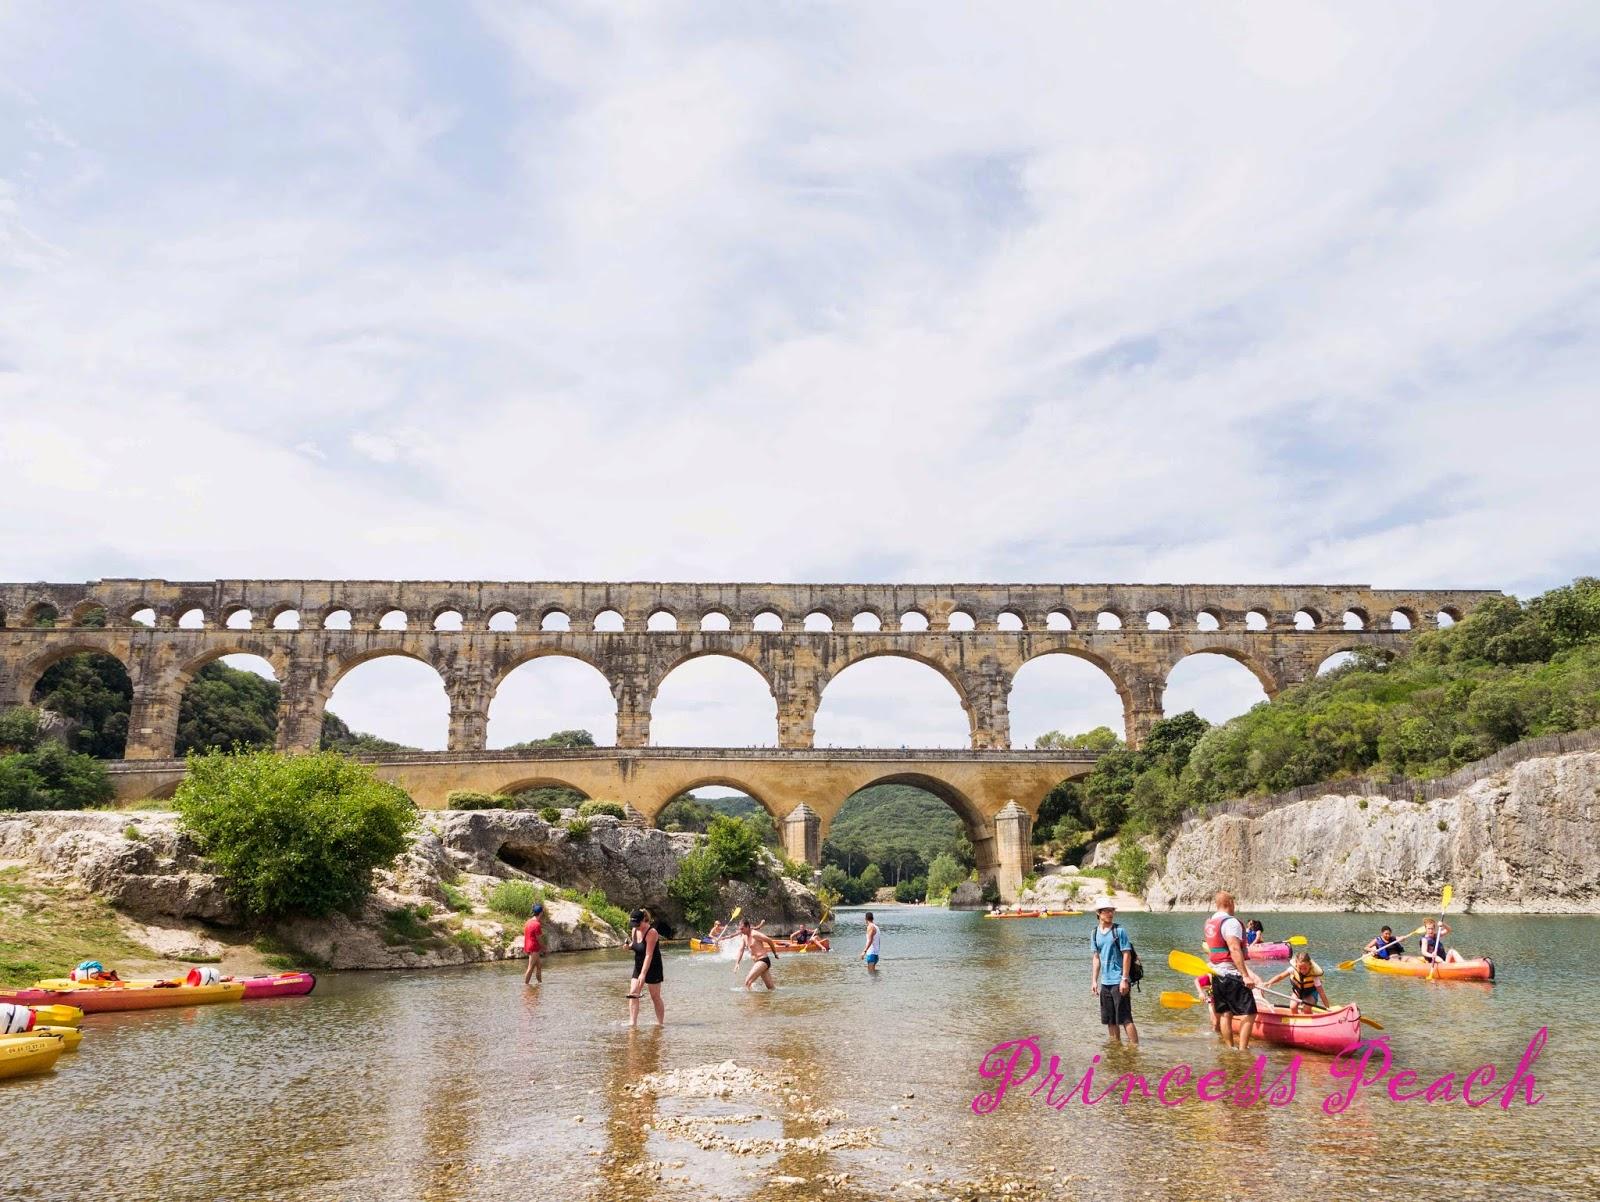 嘉德水道橋-Pont-du-Gard